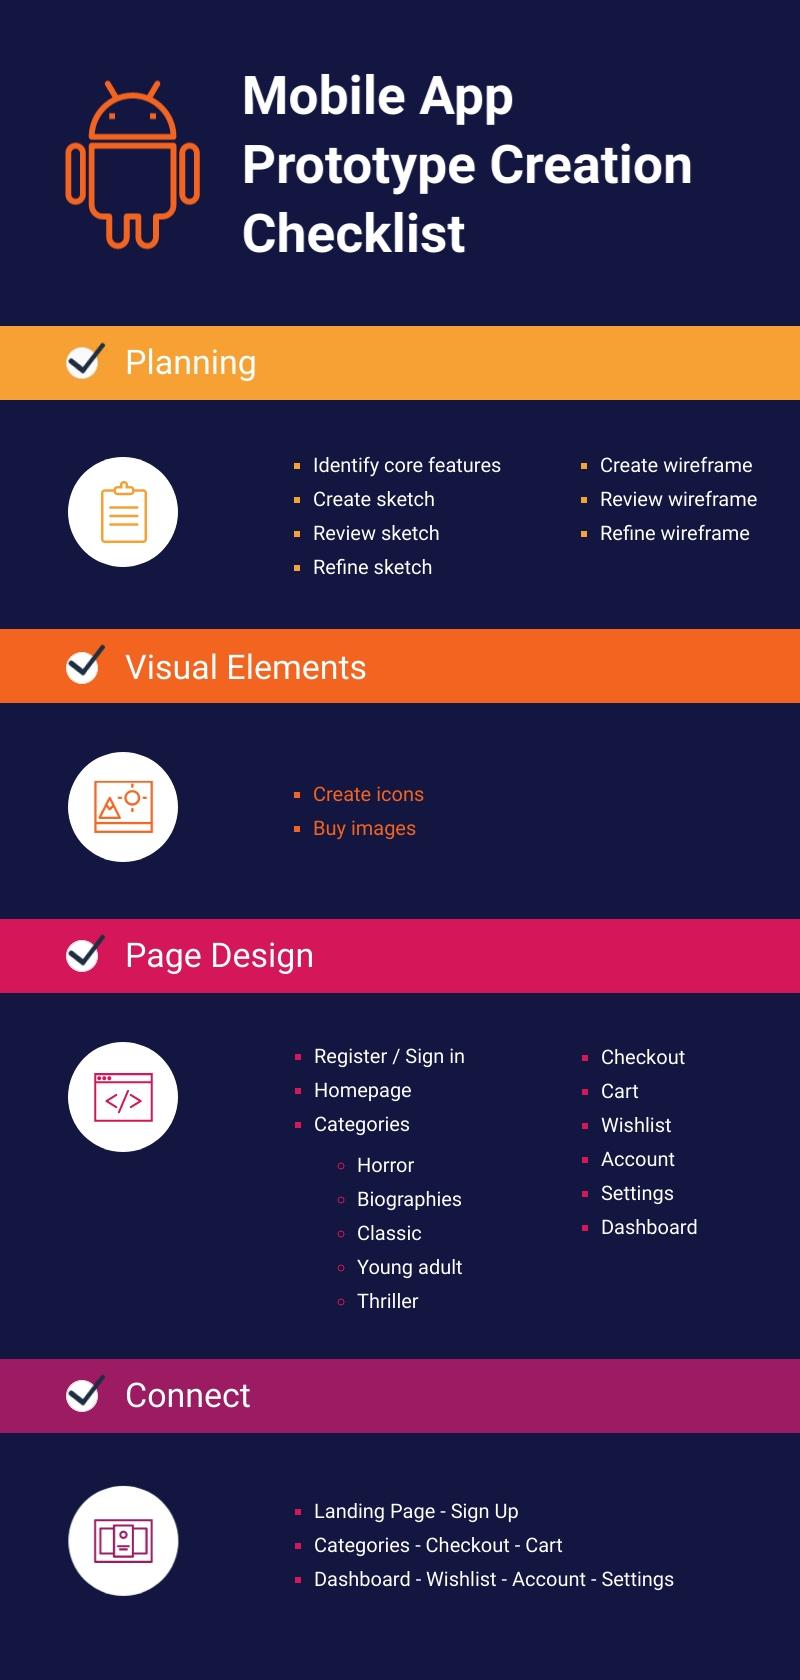 Mobile App Prototype Creation Checklist - Infographic Template